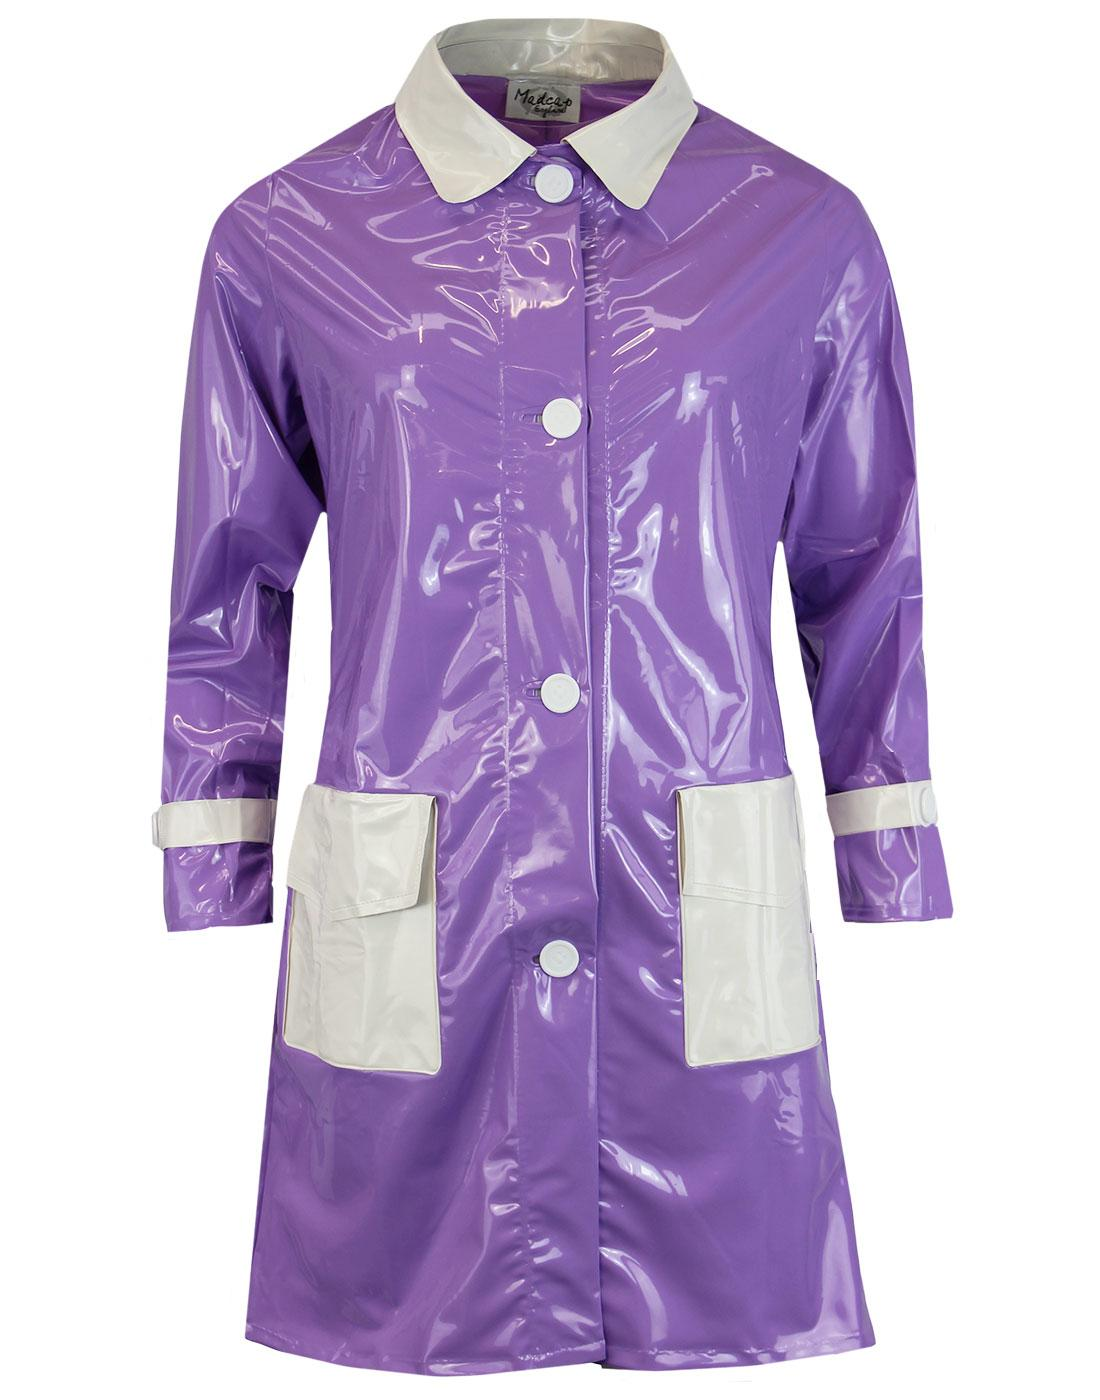 madcap england robin 60s mod pvc raincoat violet